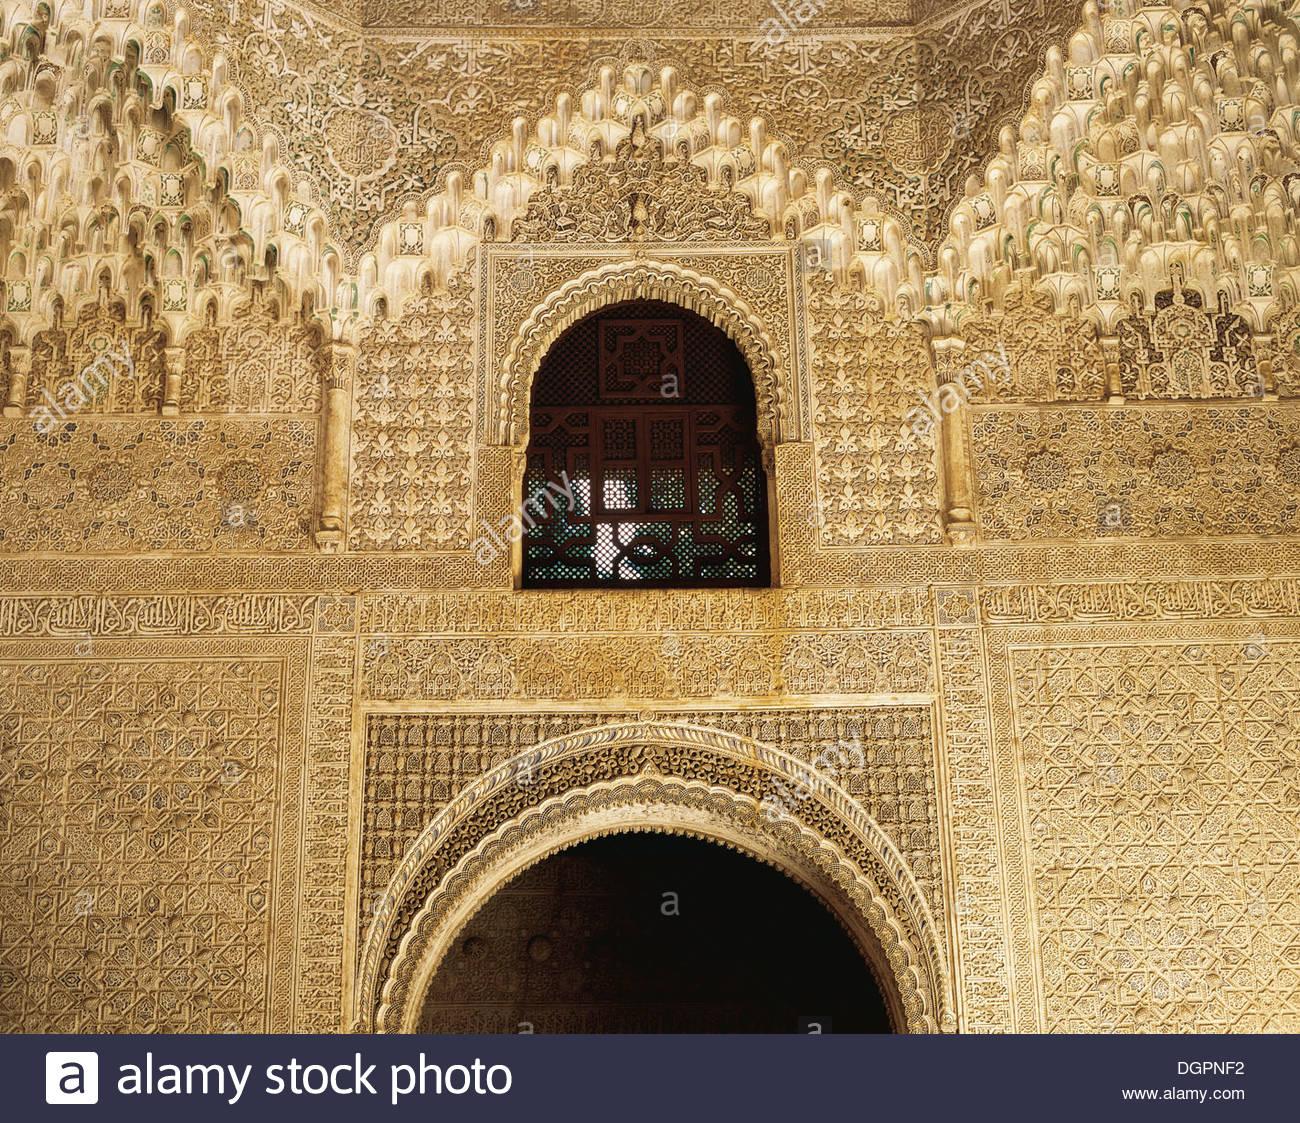 stucco alhambra photos stucco alhambra images alamy. Black Bedroom Furniture Sets. Home Design Ideas